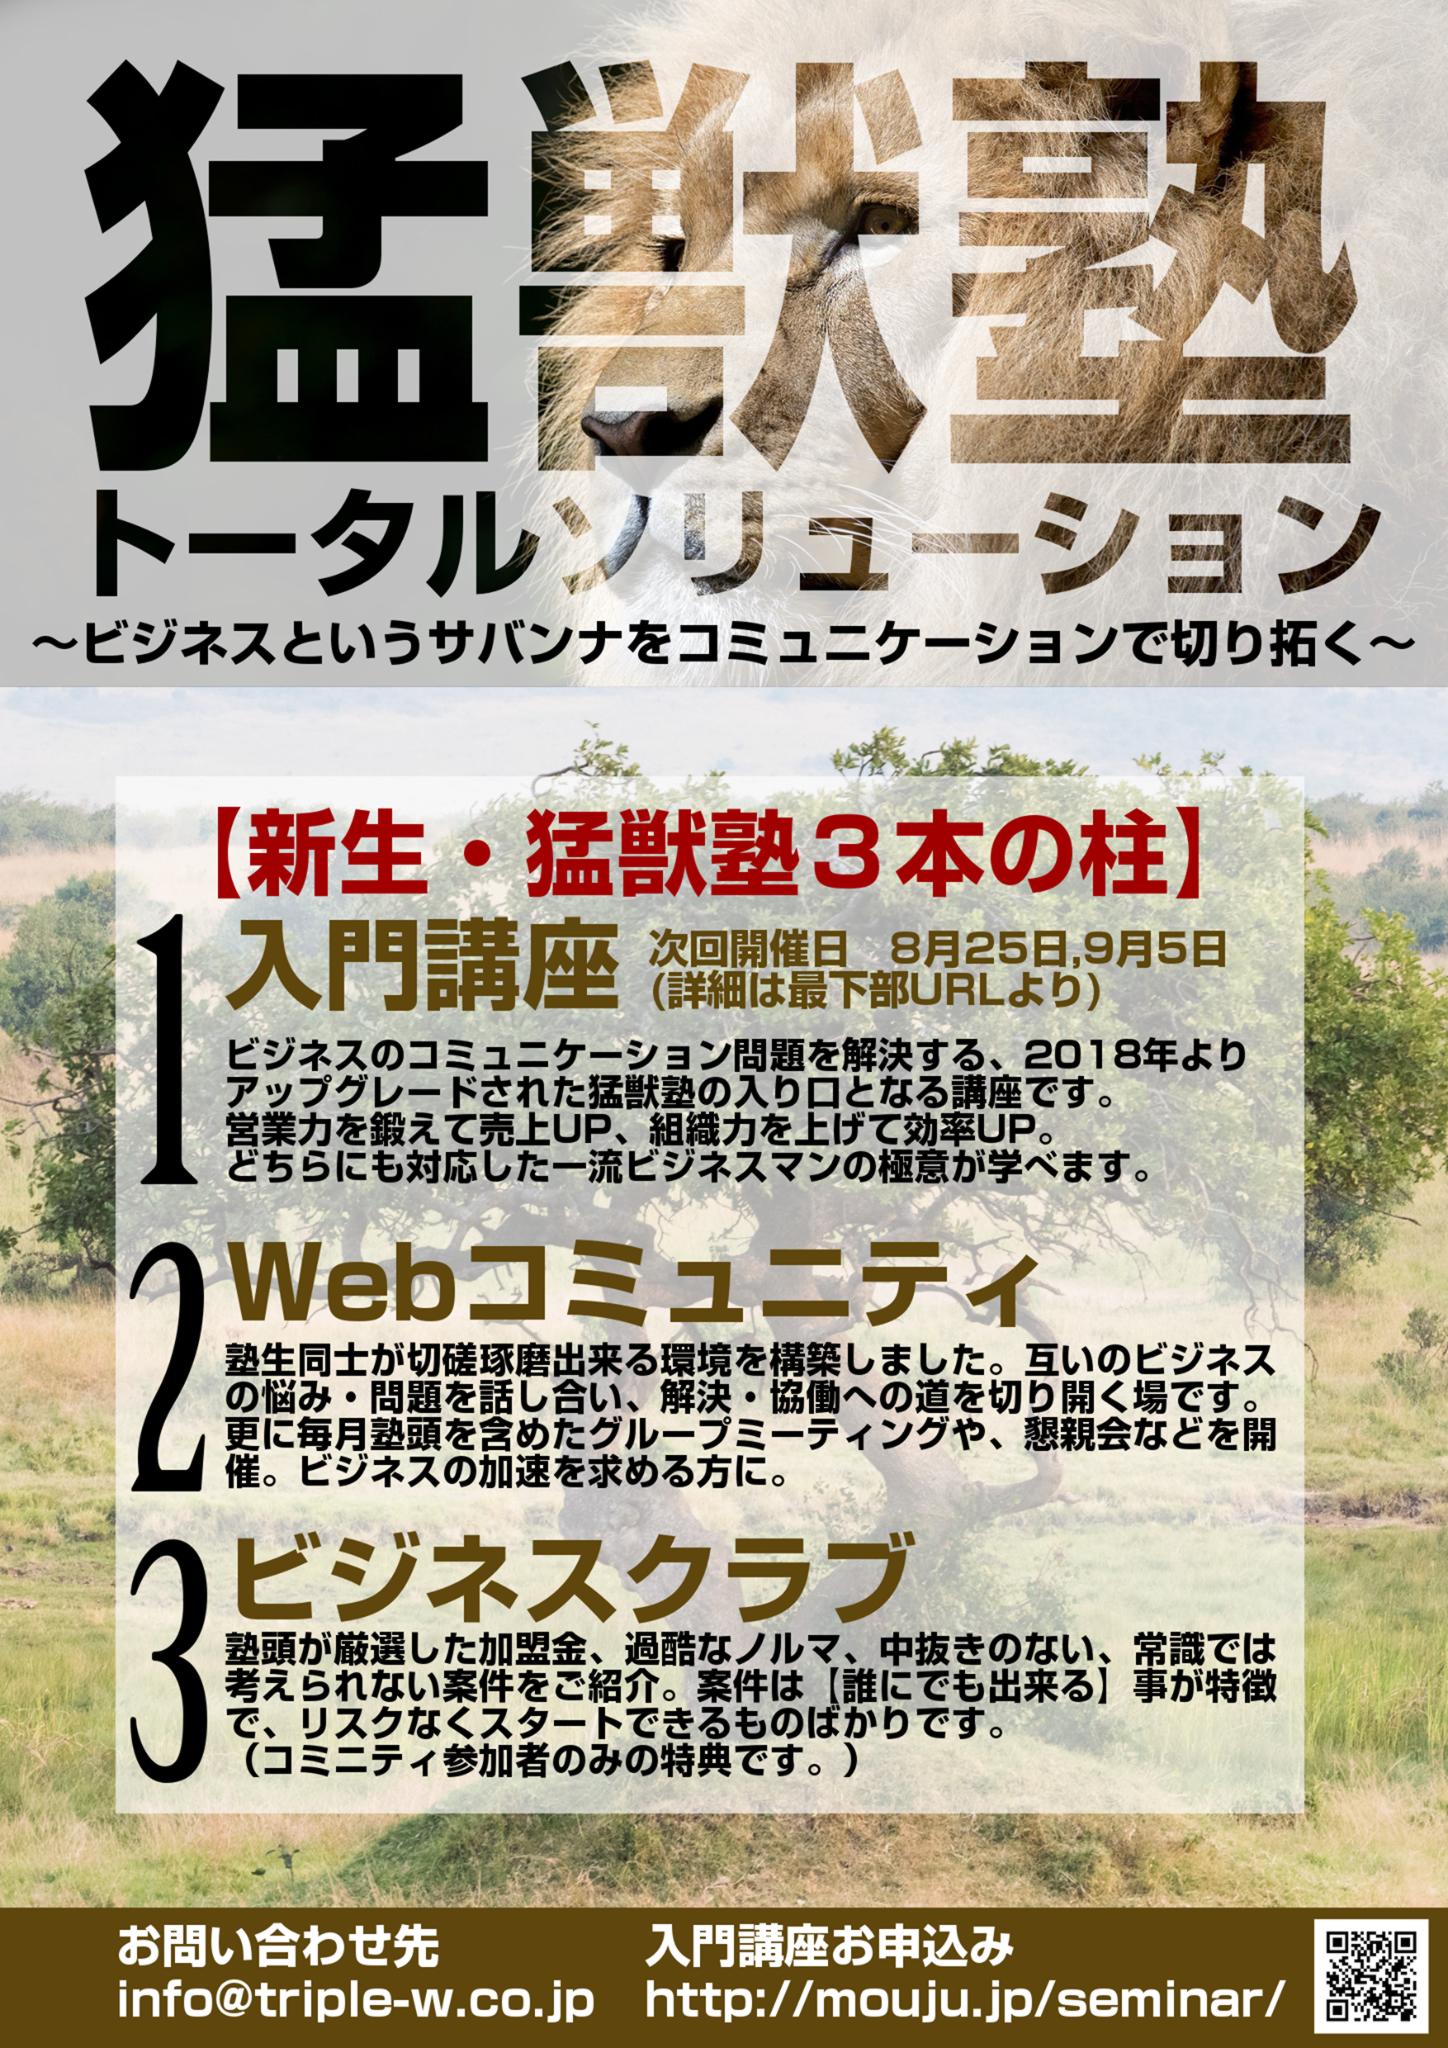 a - 11月30日開催、猛獣会議Vol.1